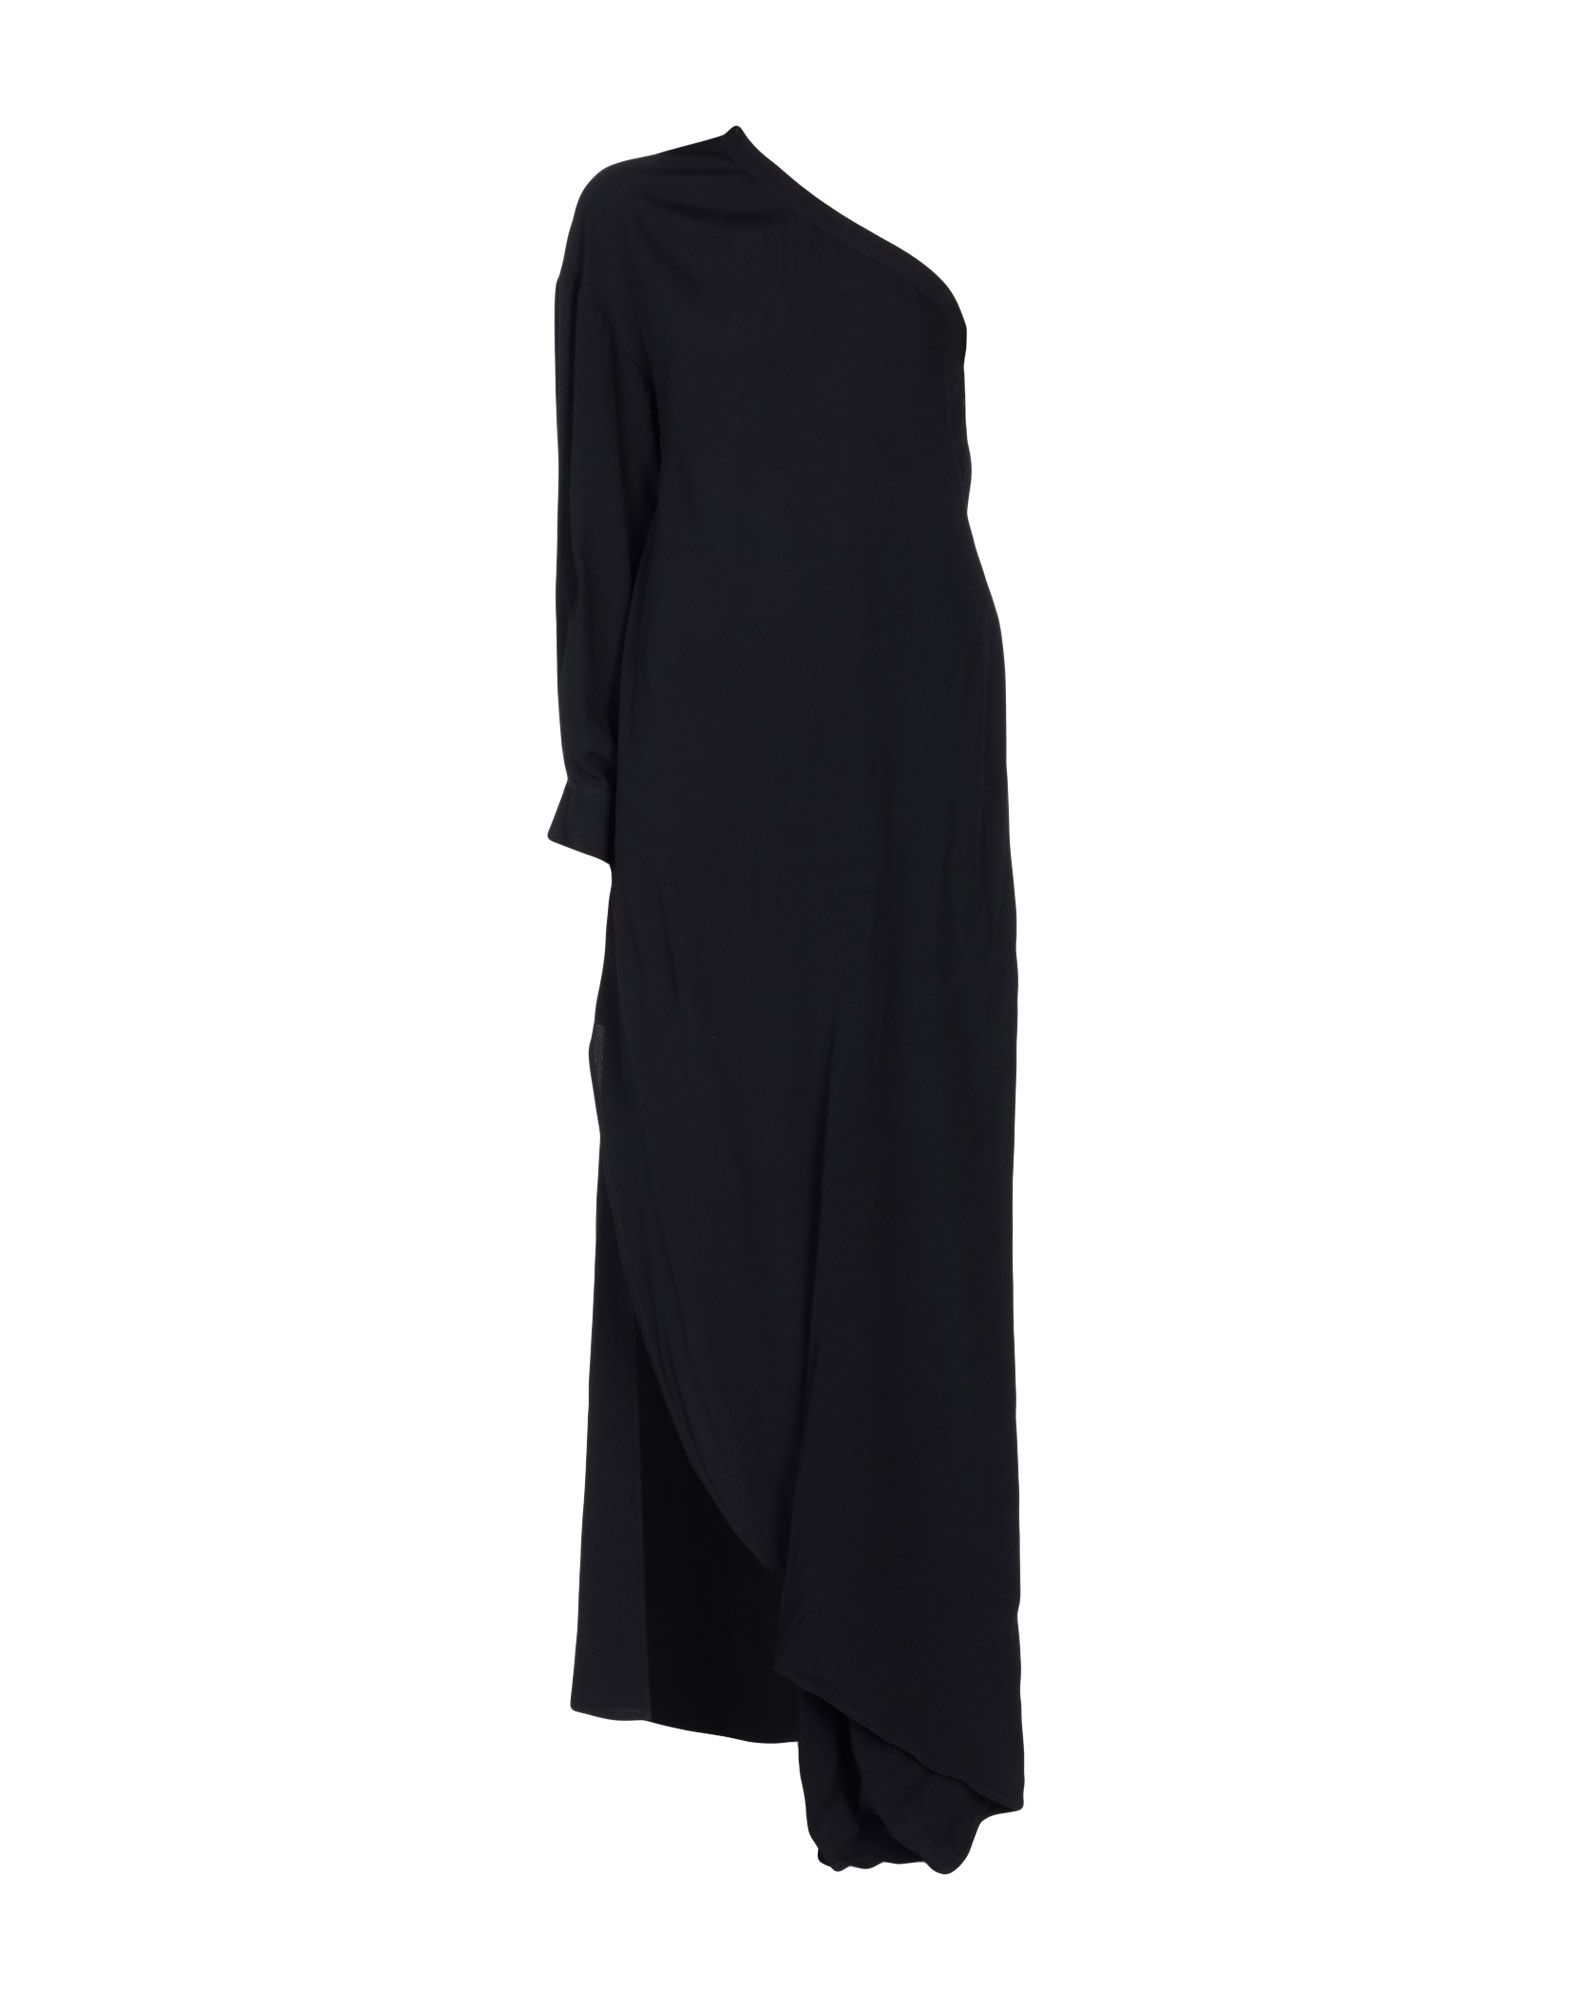 Фото - ROSETTA GETTY Длинное платье rosetta getty топ без рукавов